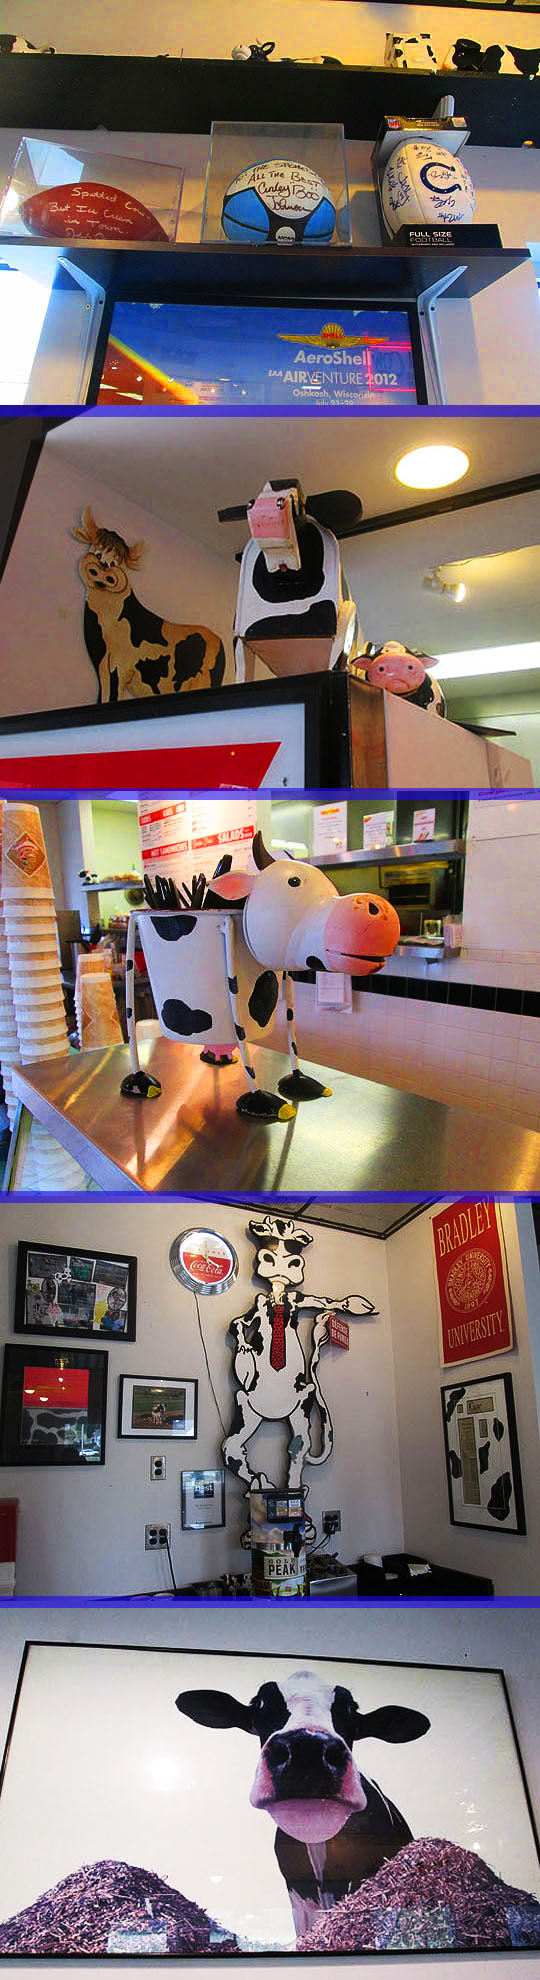 6. cows_august22-17.jpg